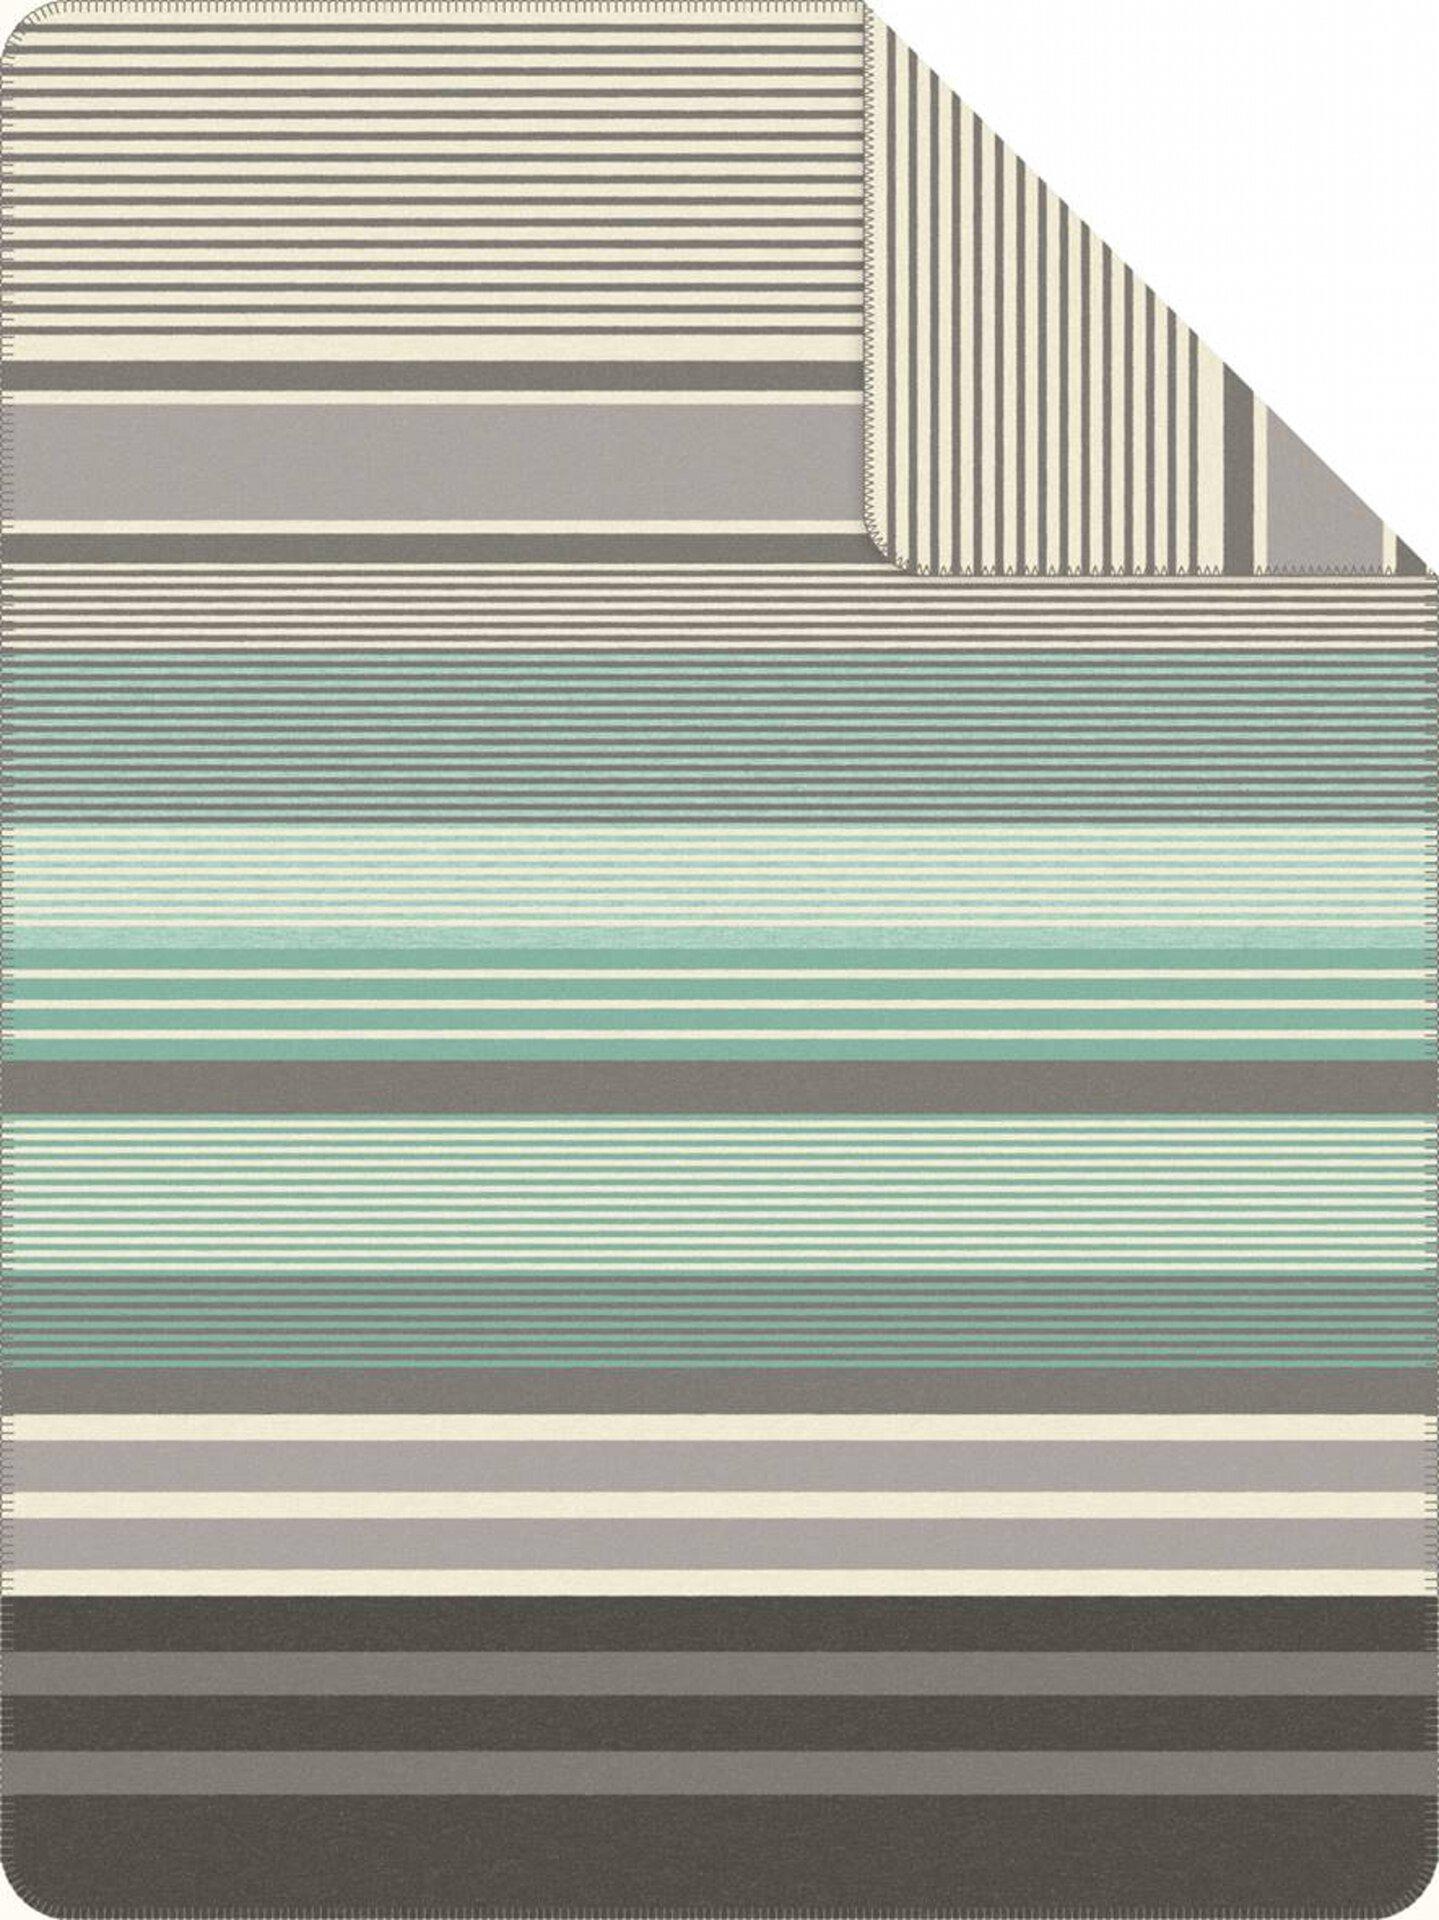 Jacquard Decke S. Oliver Textil 150 x 200 cm